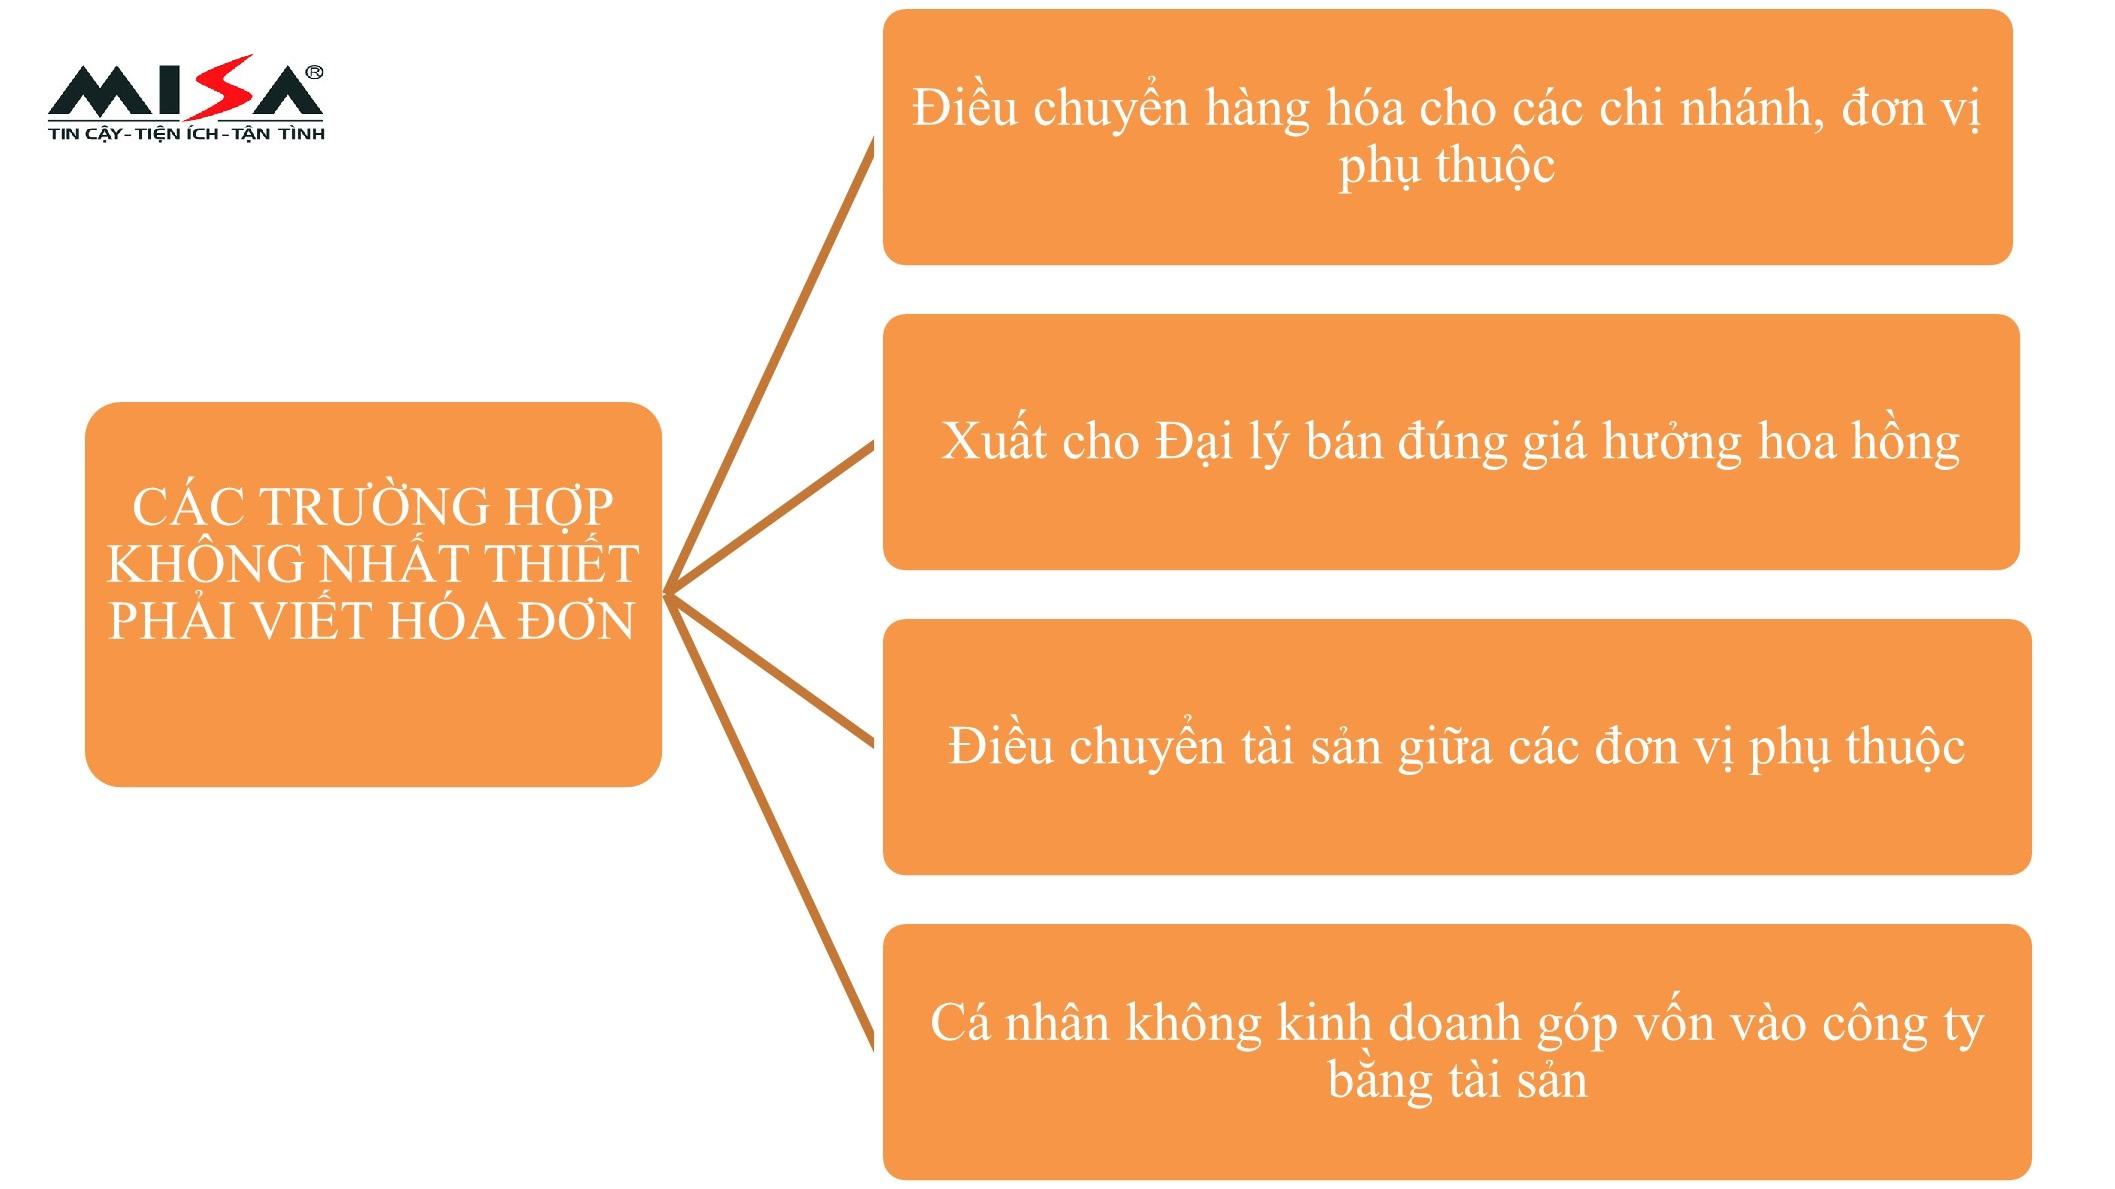 cac-truong-hop-khong-can-xuat-hoa-don-1